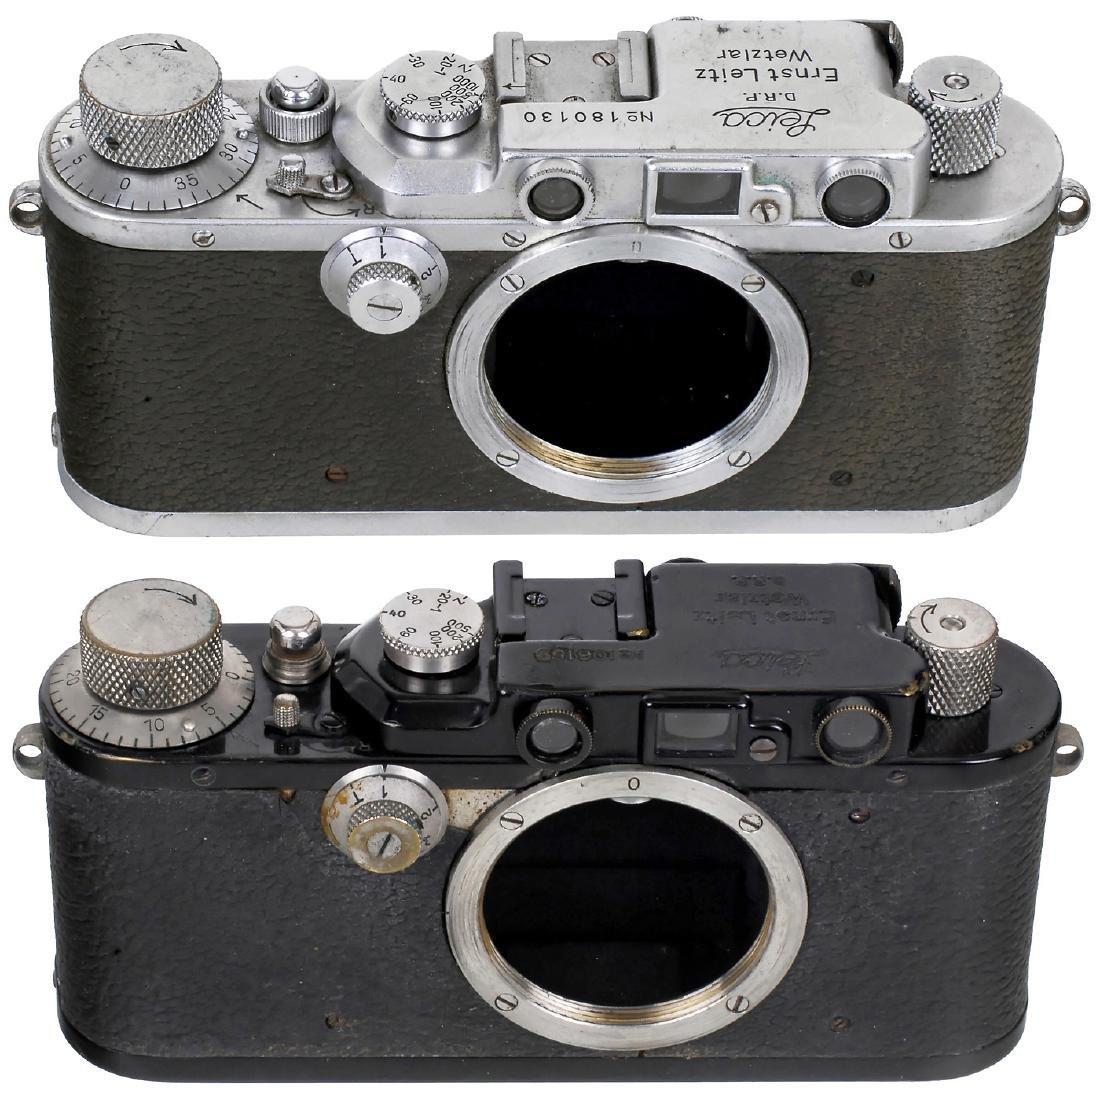 Leica II (Converted) and Leica IIIa